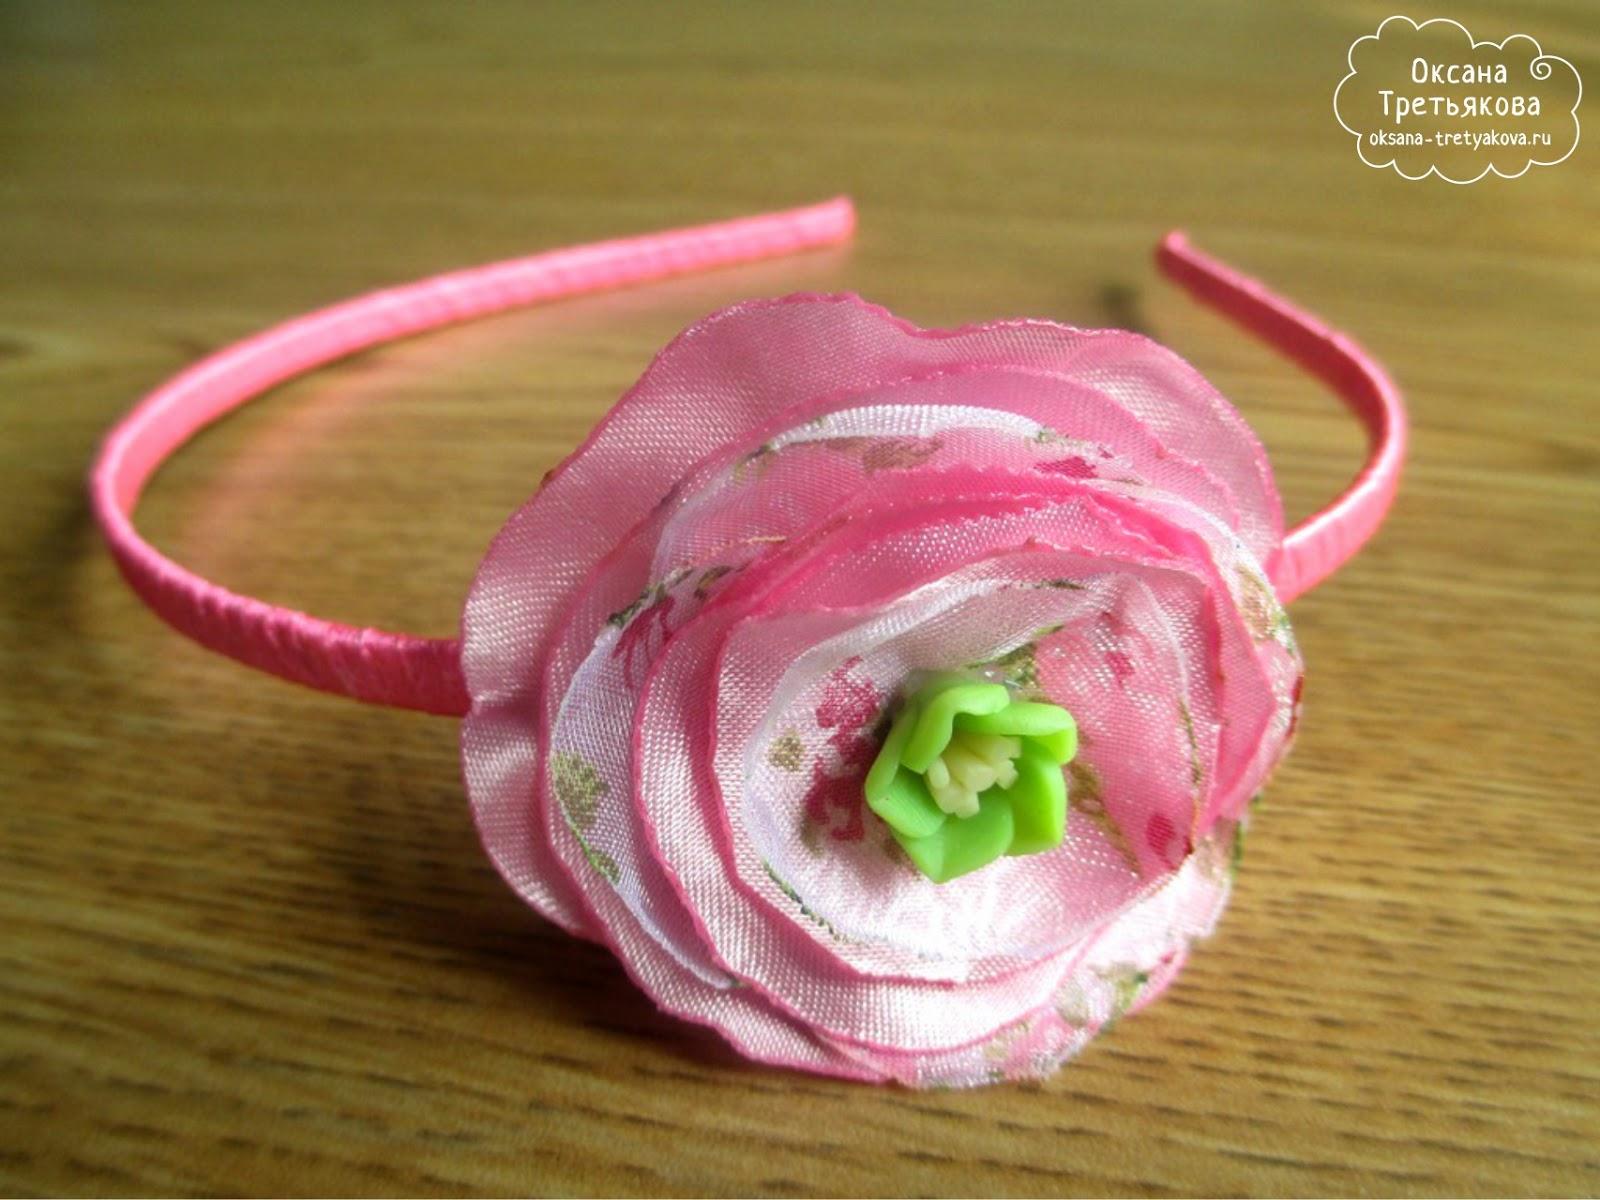 Мастер-класс ободок с цветком из ткани